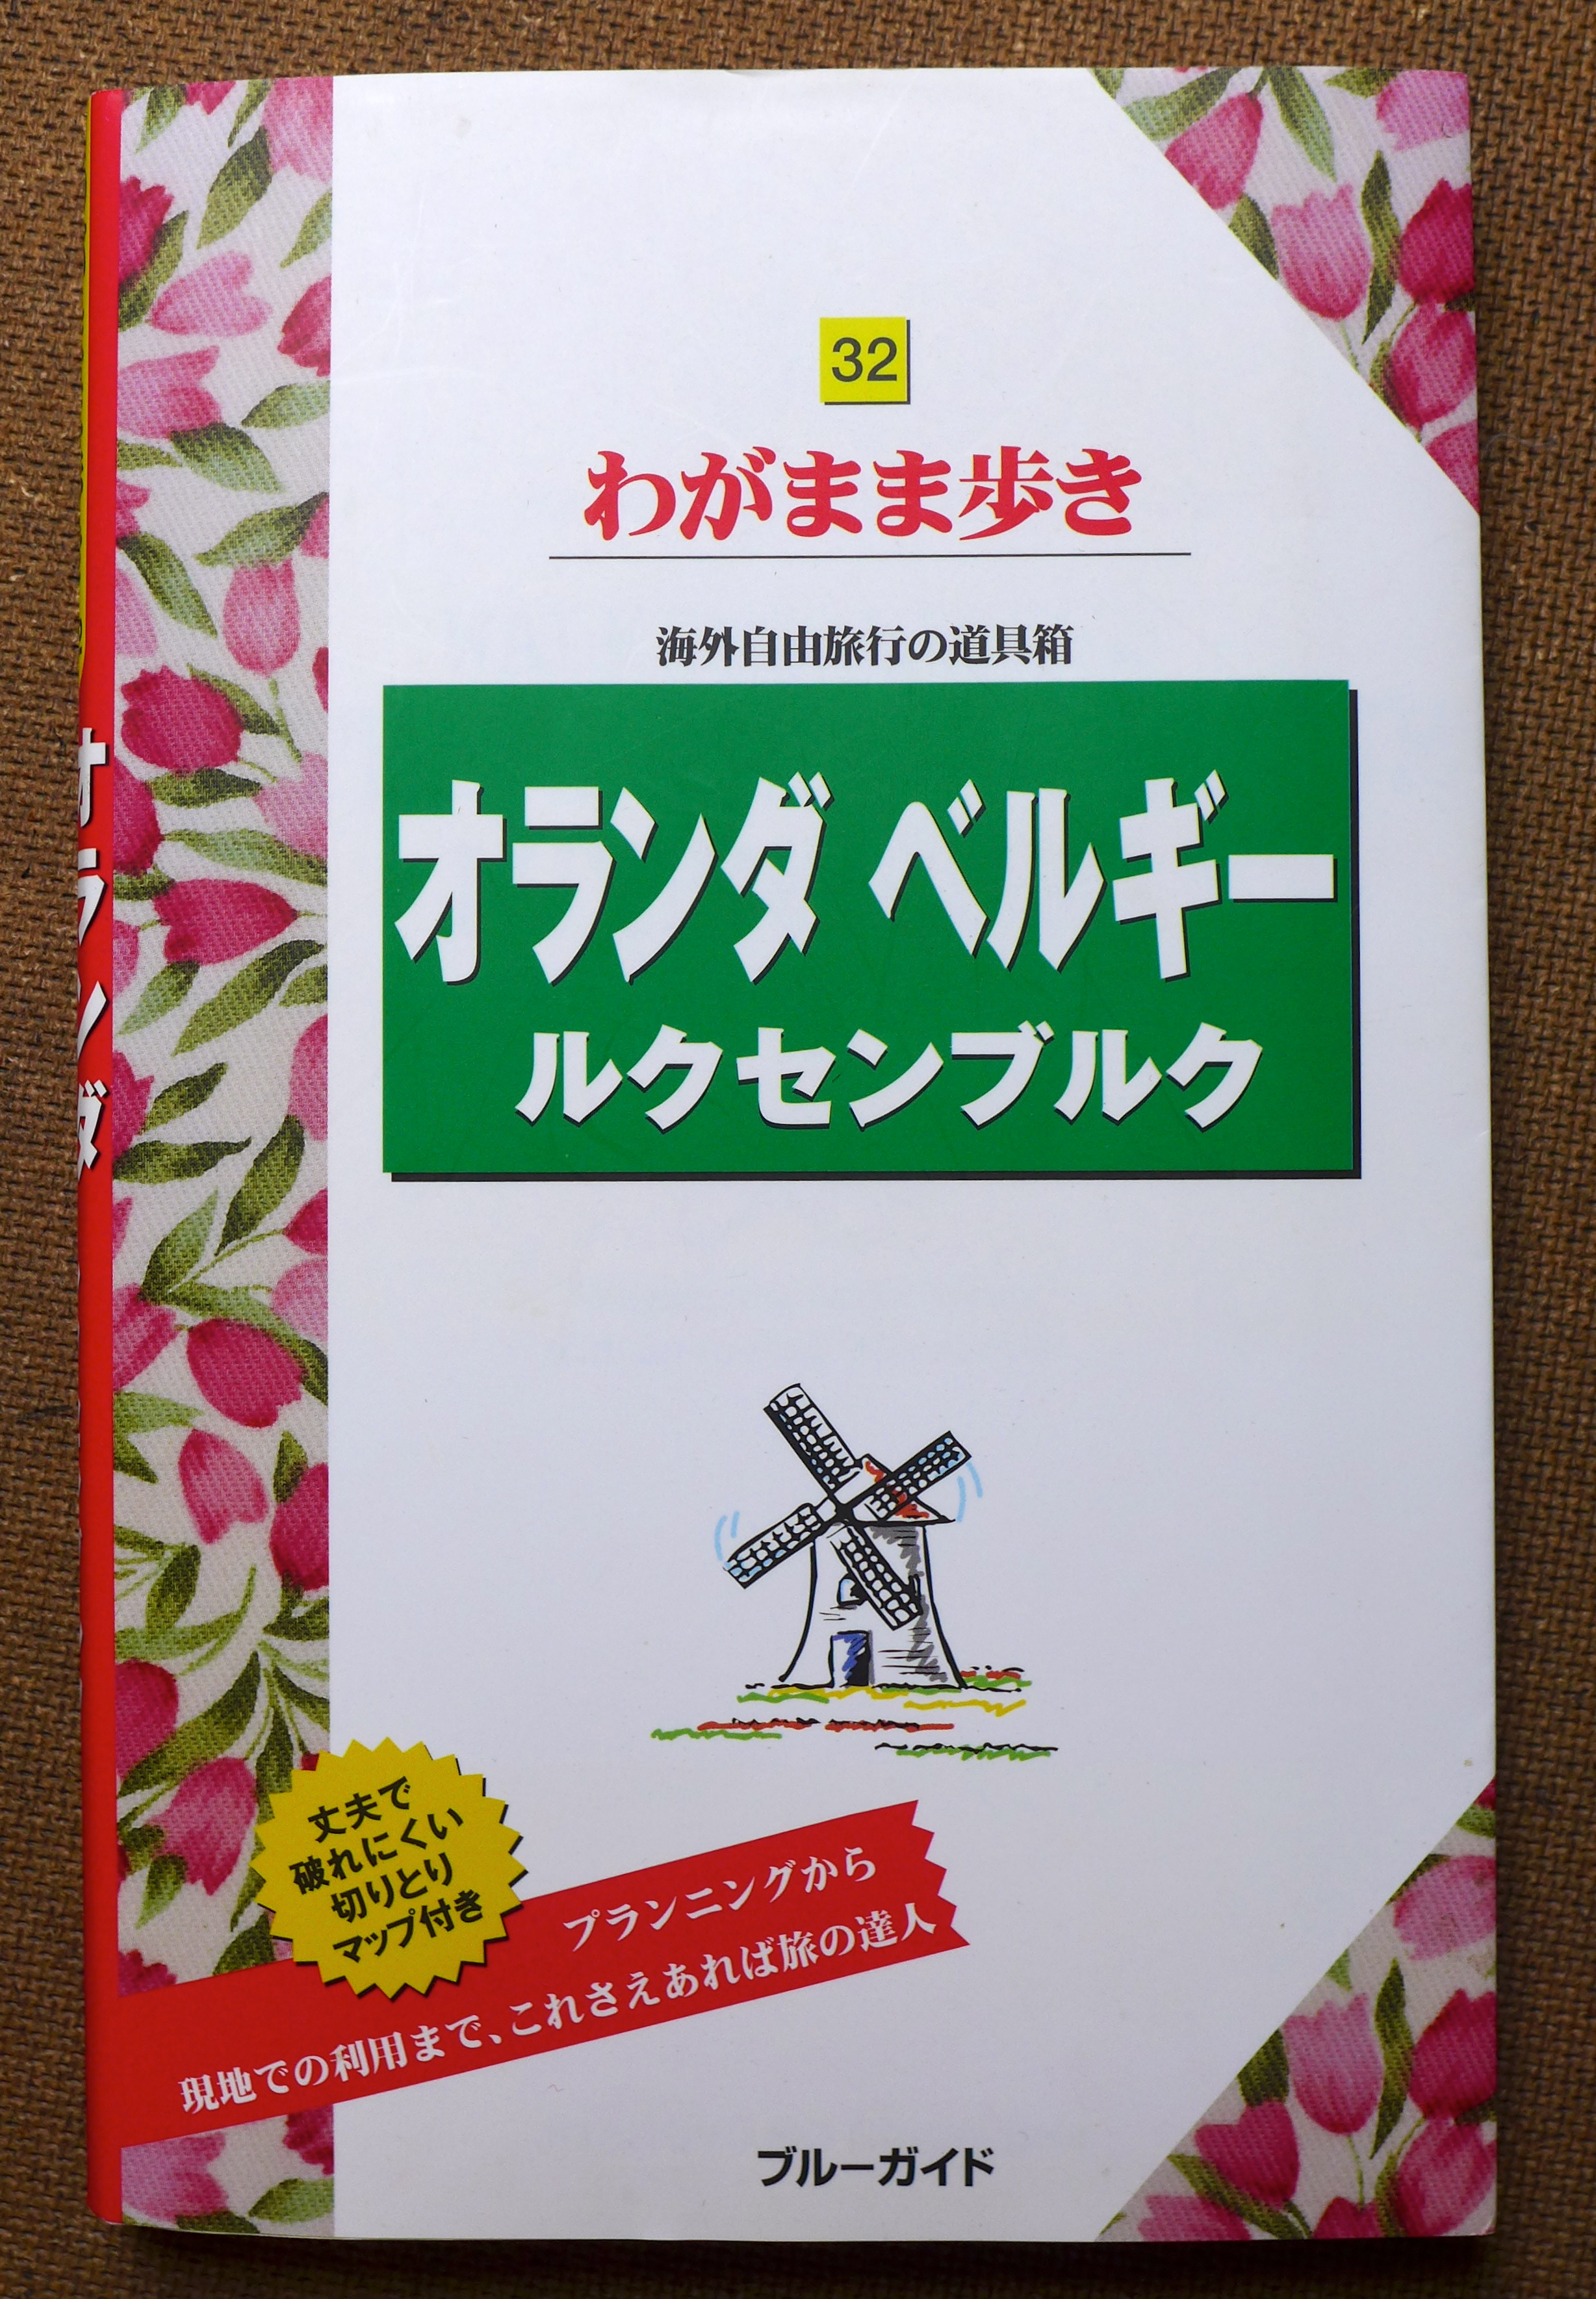 TomokoFREDERIX